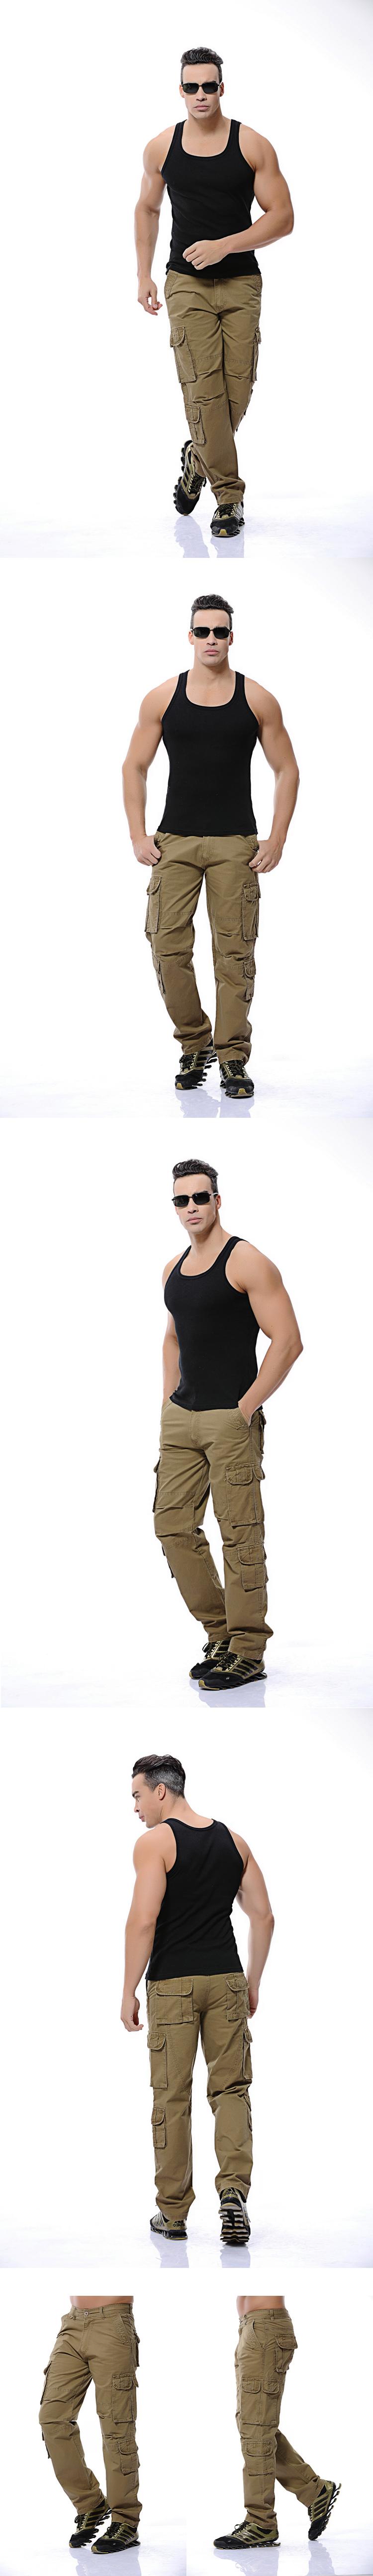 TB2KvmQmpXXXXbNXXXXXXXXXXXX !!325452514 Fashion Military Cargo Pants Men Loose Baggy Tactical Trousers Oustdoor Casual Cotton Cargo Pants Men Multi Pockets Big size